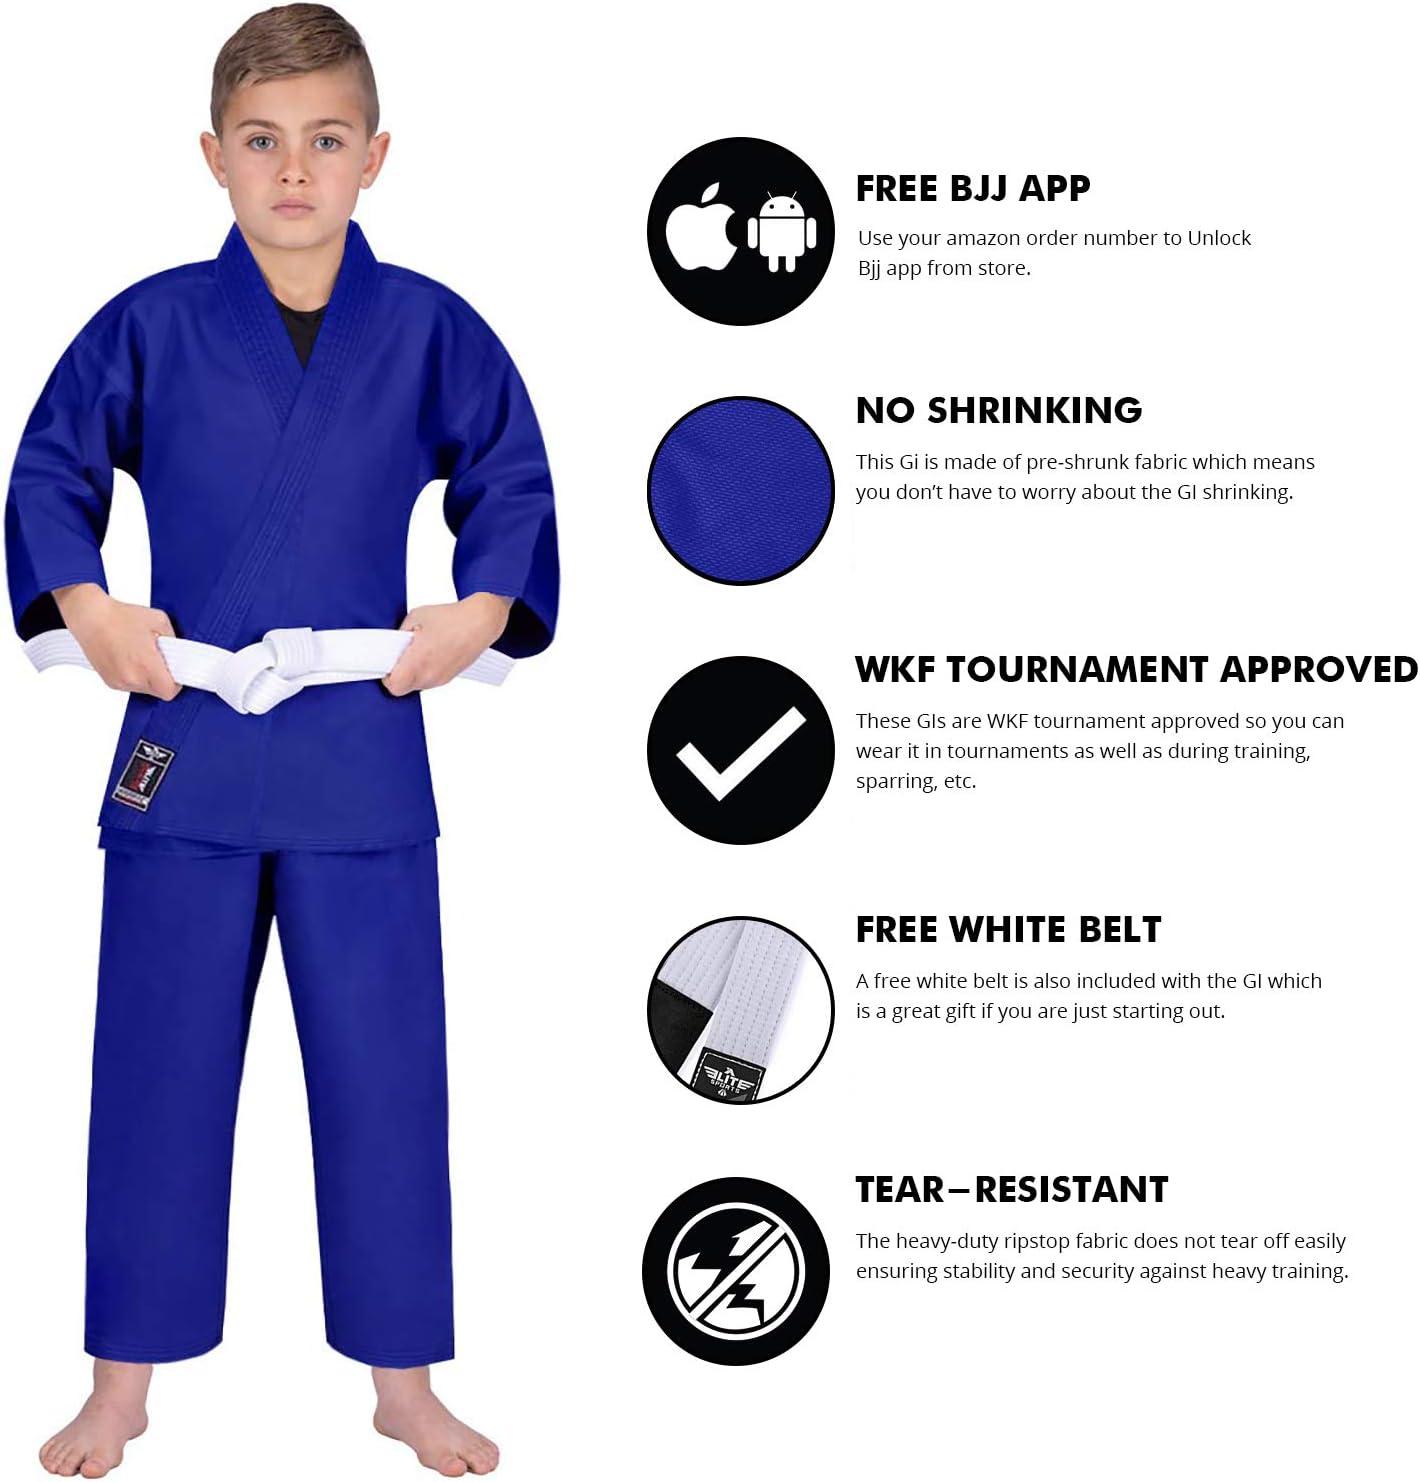 Elite Sports Kids Karate GI Uniforms Lightweight Karate Uniform for Youth with Free Belt